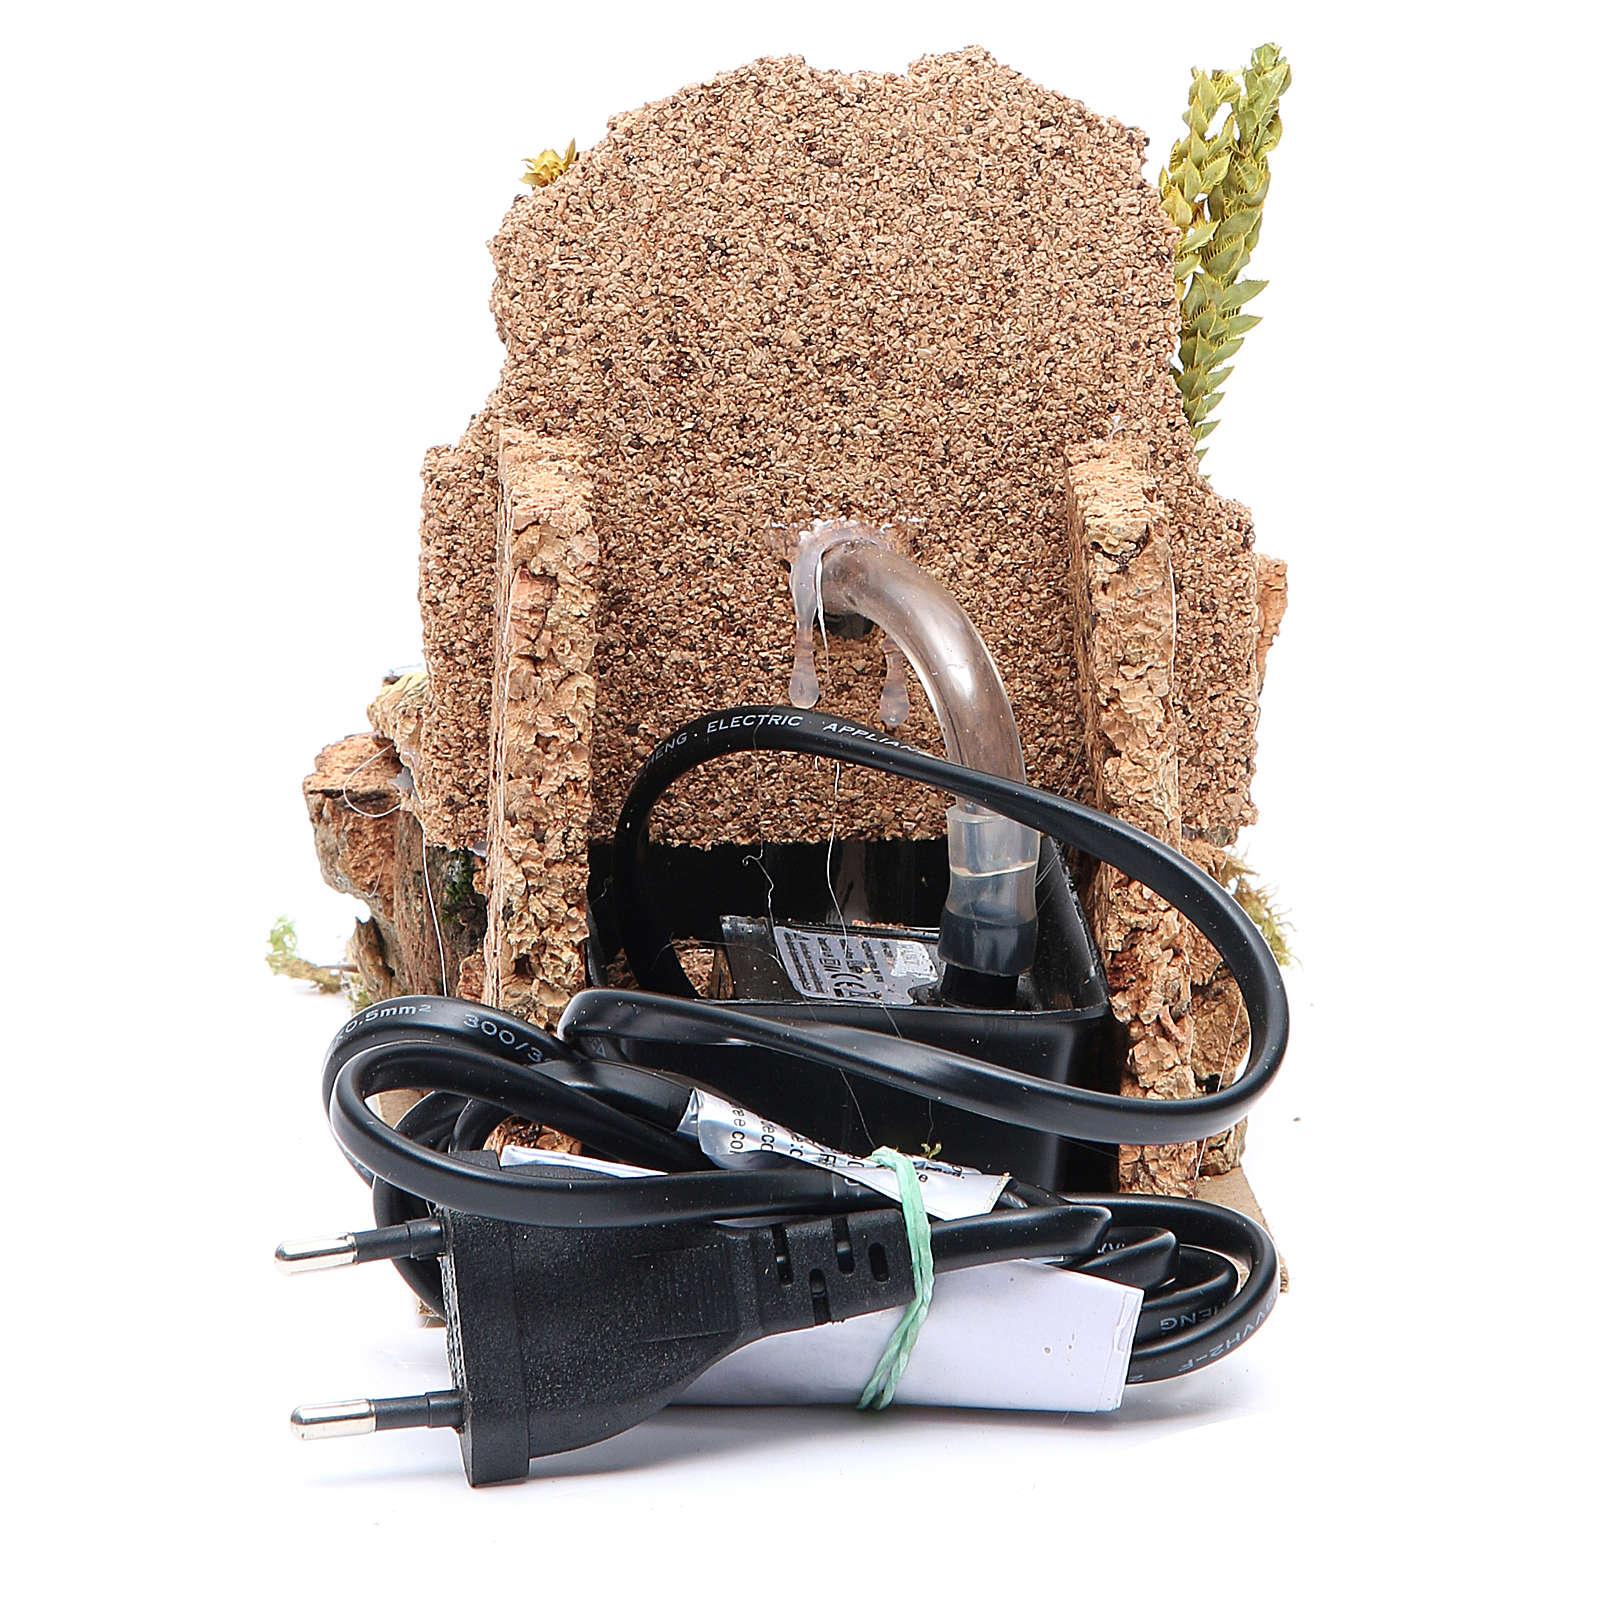 Fontanella elettrica presepe 14x10x15 cm 4